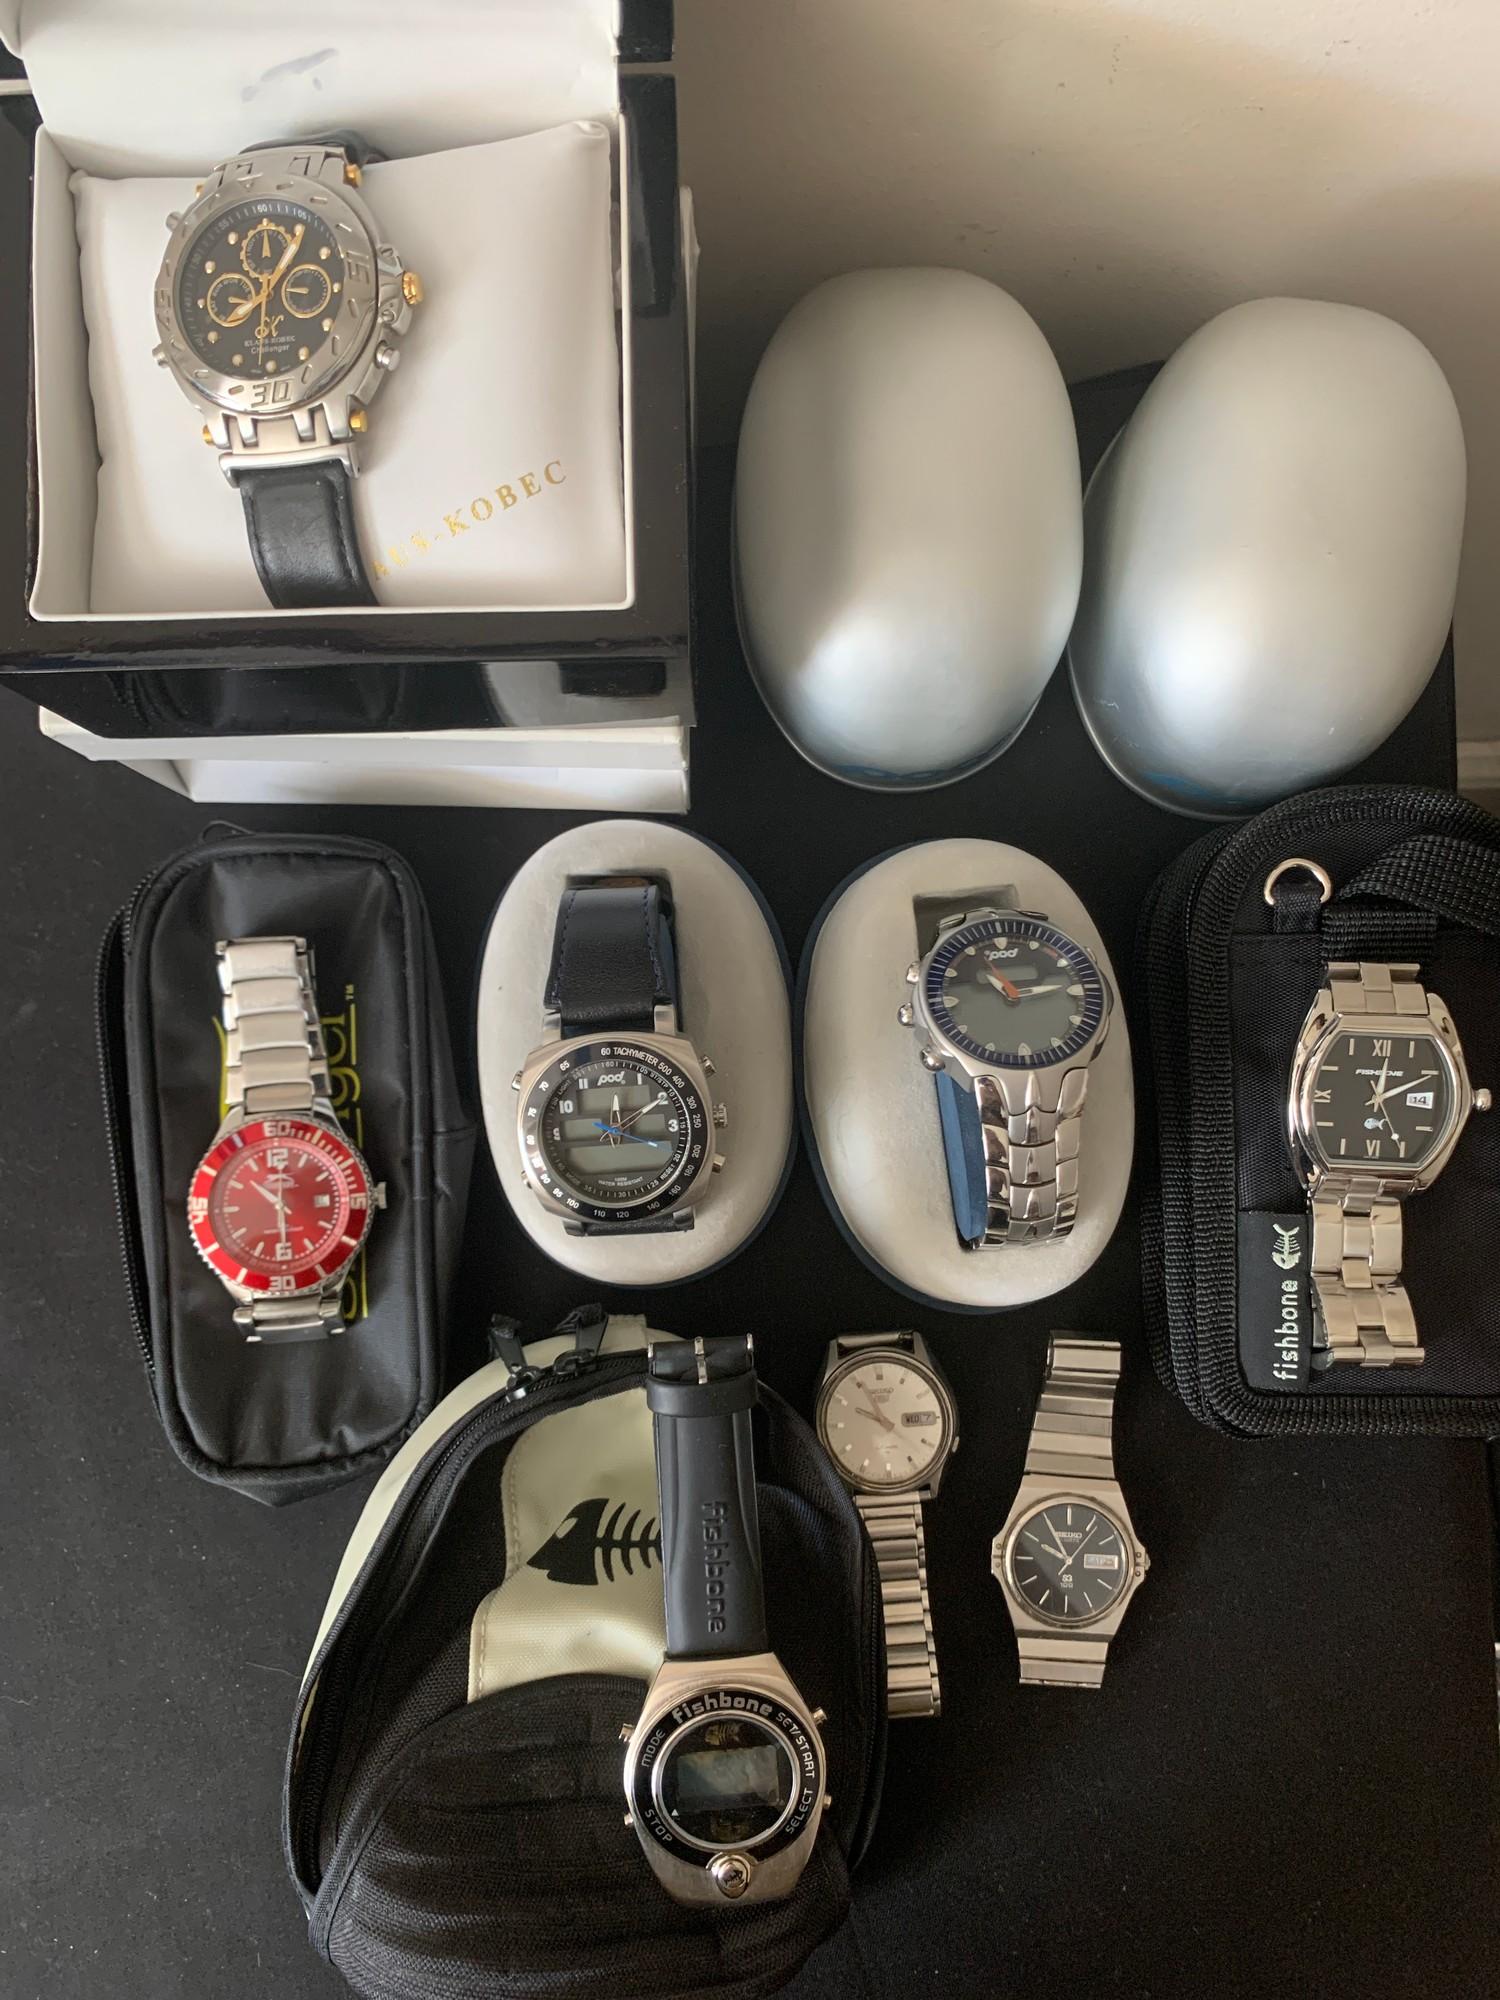 Eight gentlemen's wristwatches to include Slazenger, Klaus Kobec, Pod, Fishbone and Seiko.